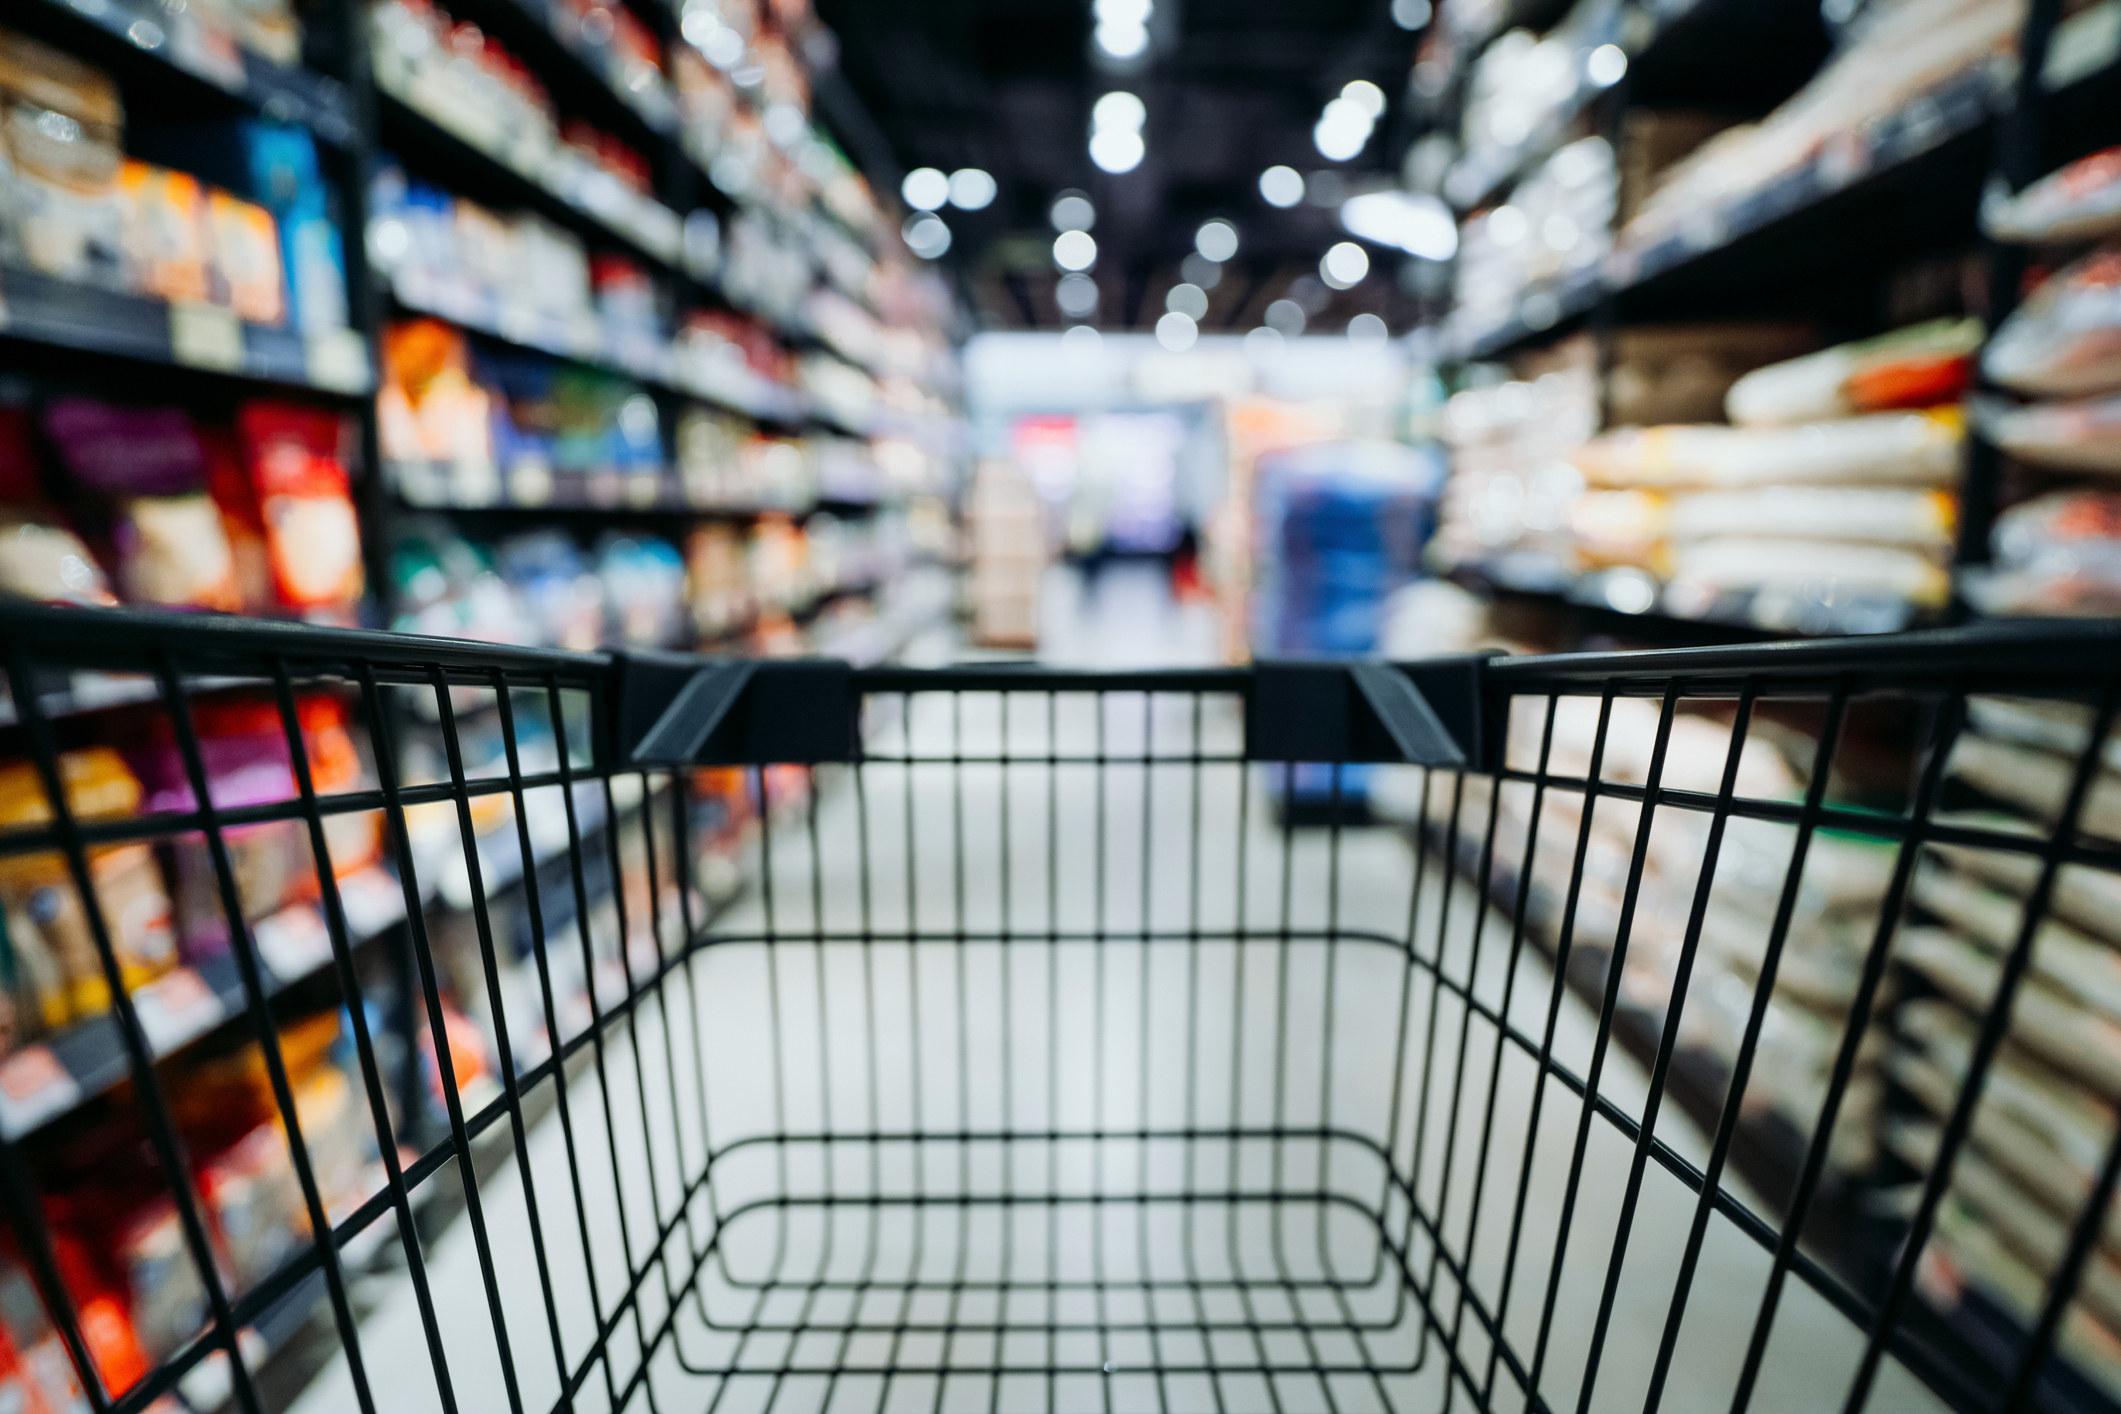 an empty grocery cart